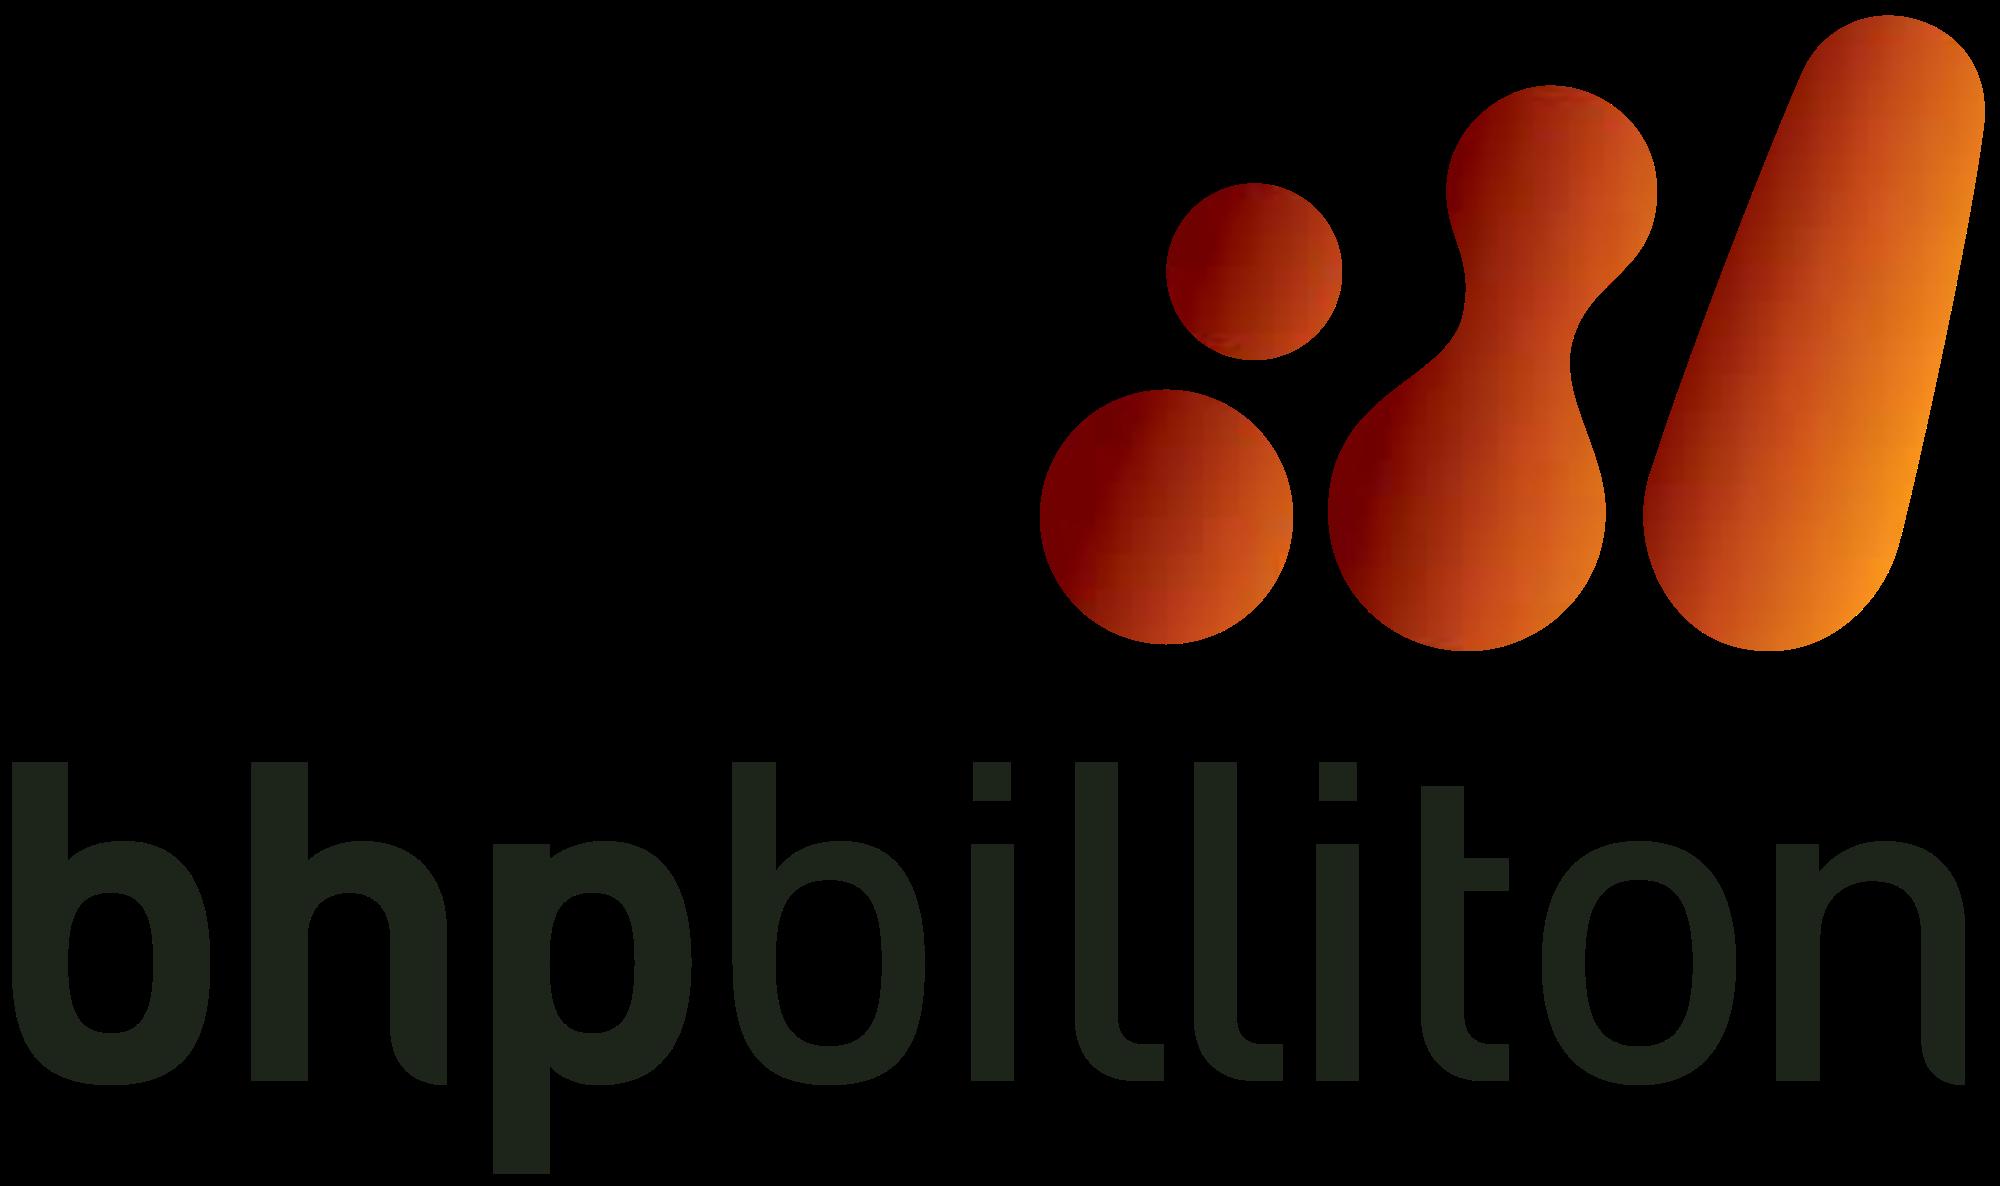 bhp logopedia fandom powered by wikia maintenance logo inspiration maintenance logos free